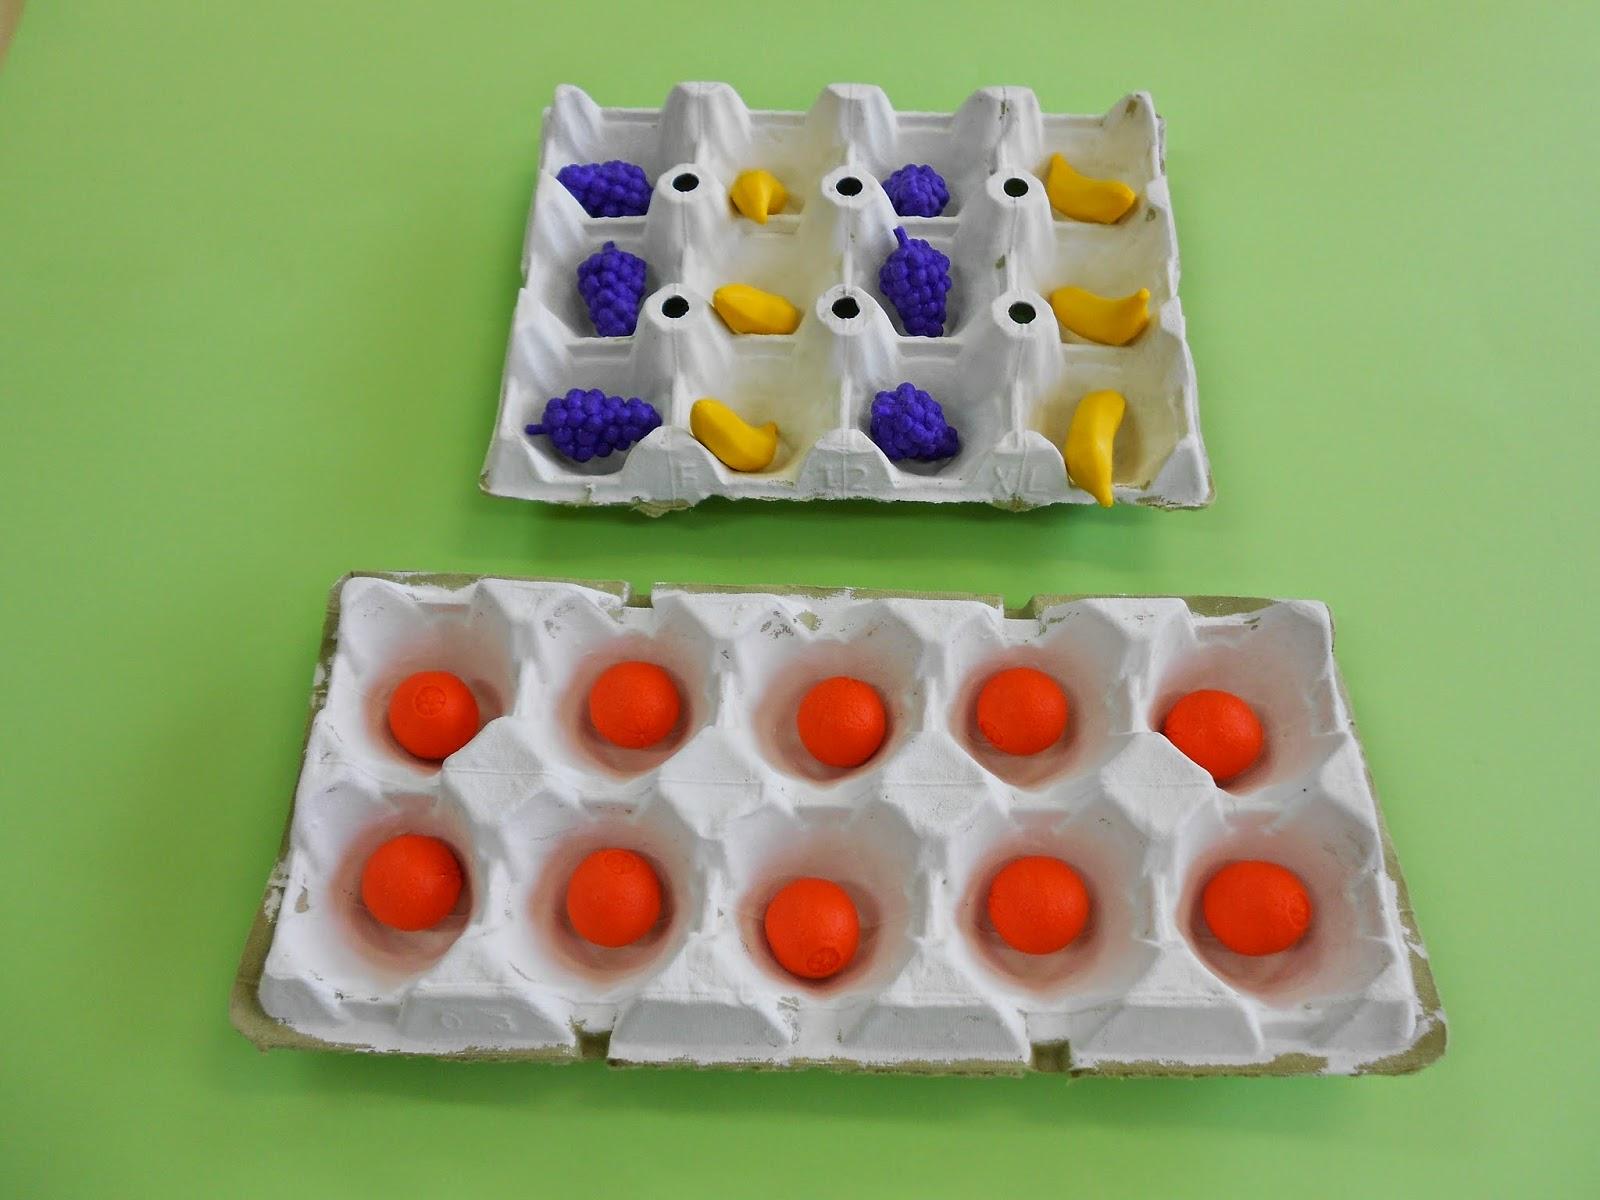 Como peces trepando rboles logica matem tica con - Colores para reciclar ...